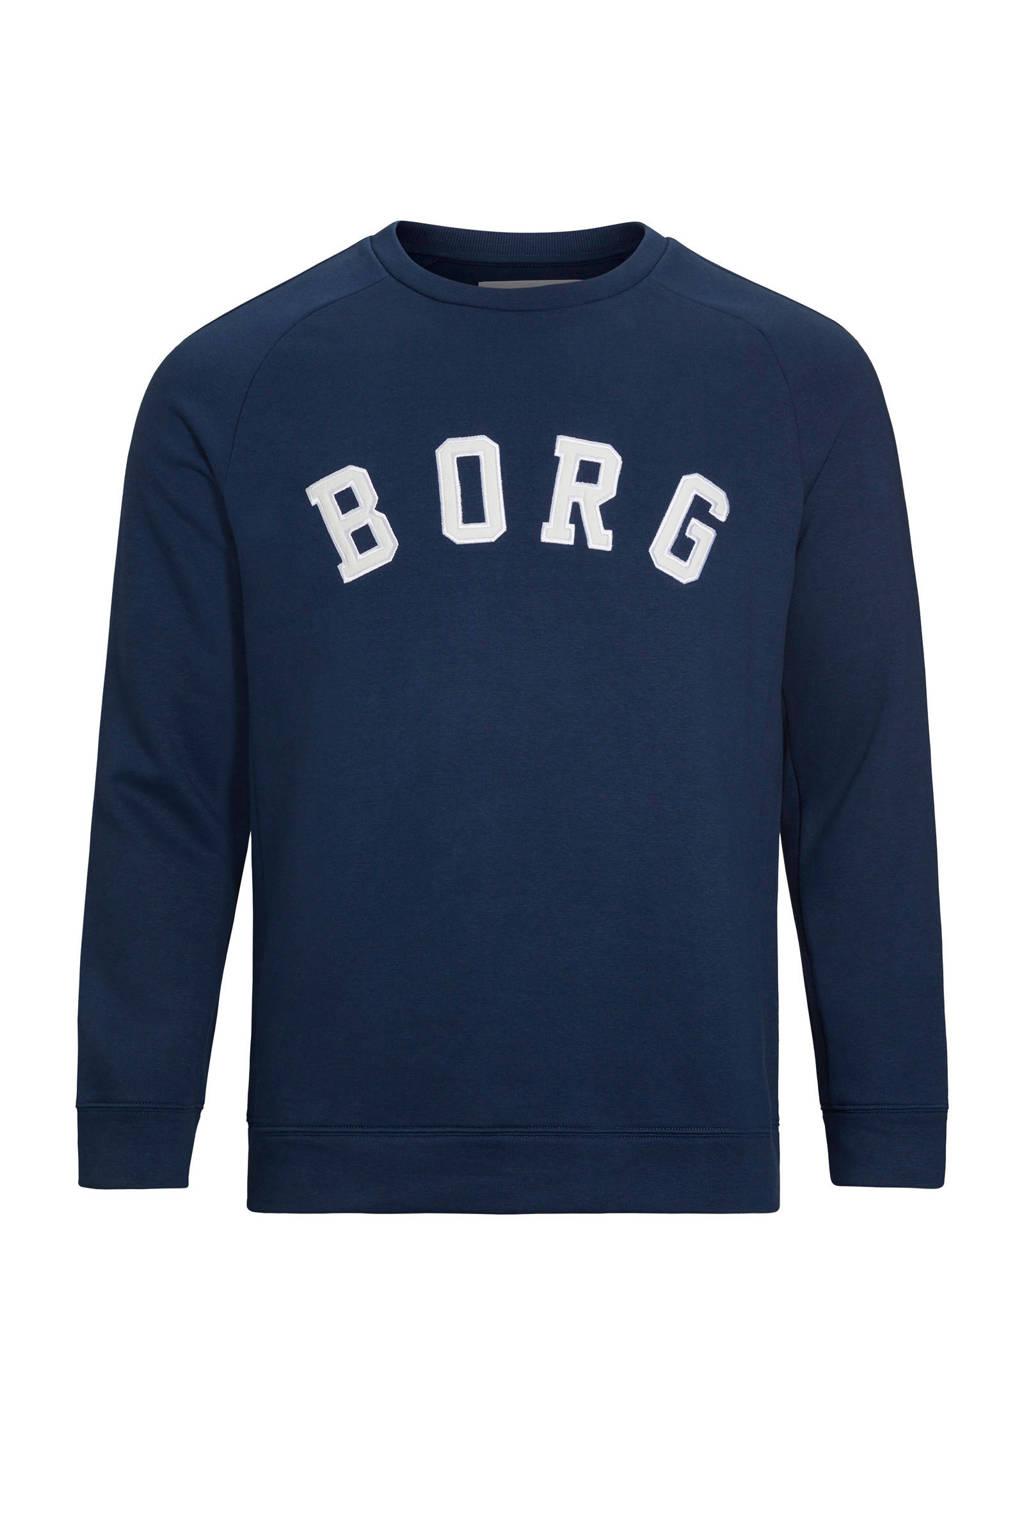 Björn Borg   sportsweater met printopdruk donkerblauw, Donkerblauw